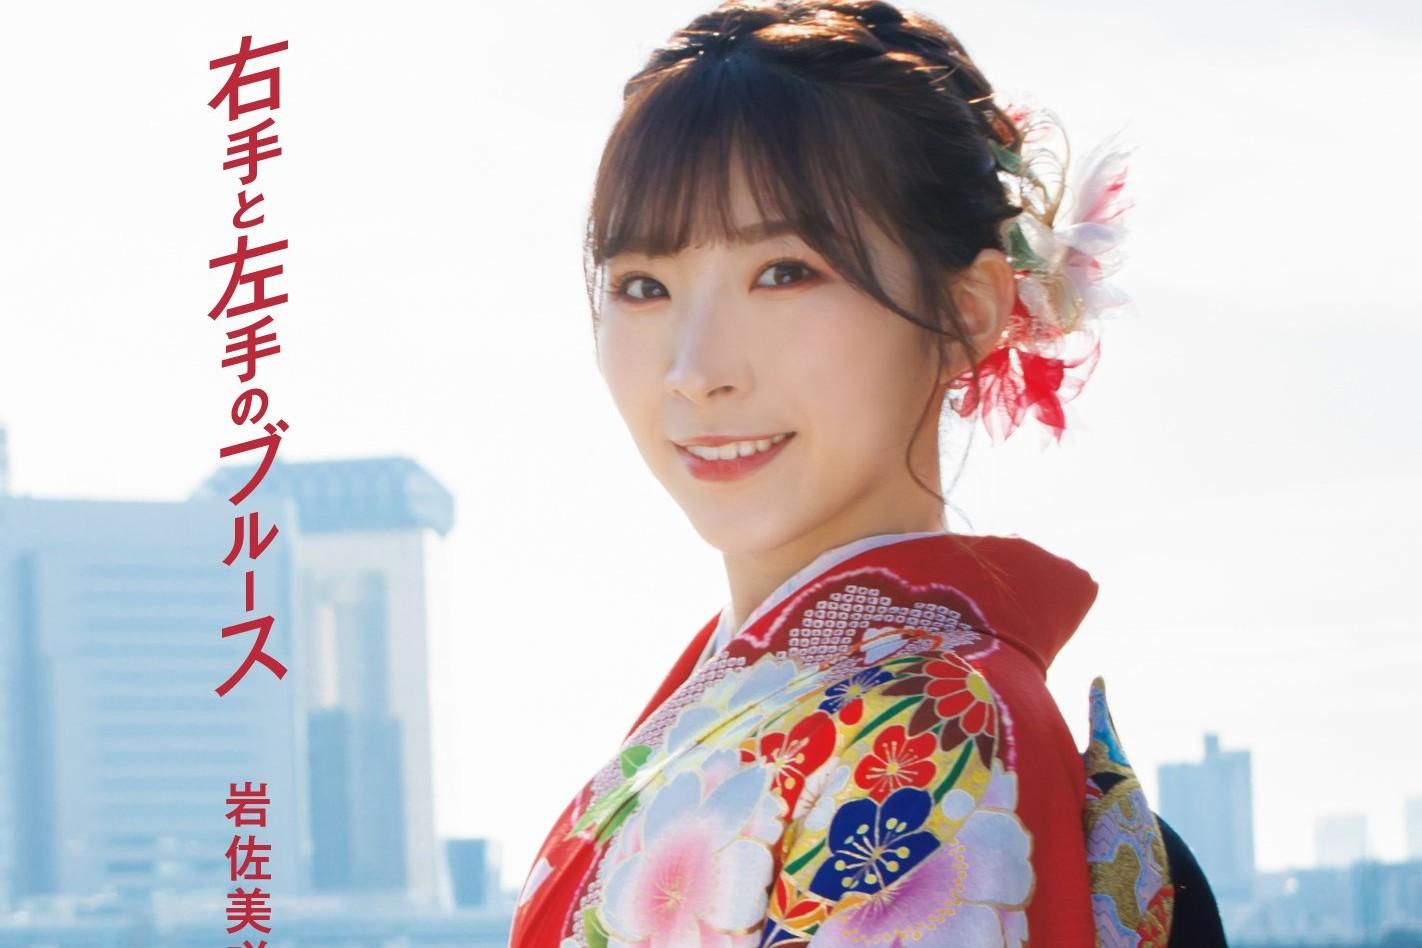 AKB48 Iwasa Misaki 9th single Migite to Hidarite no Blues